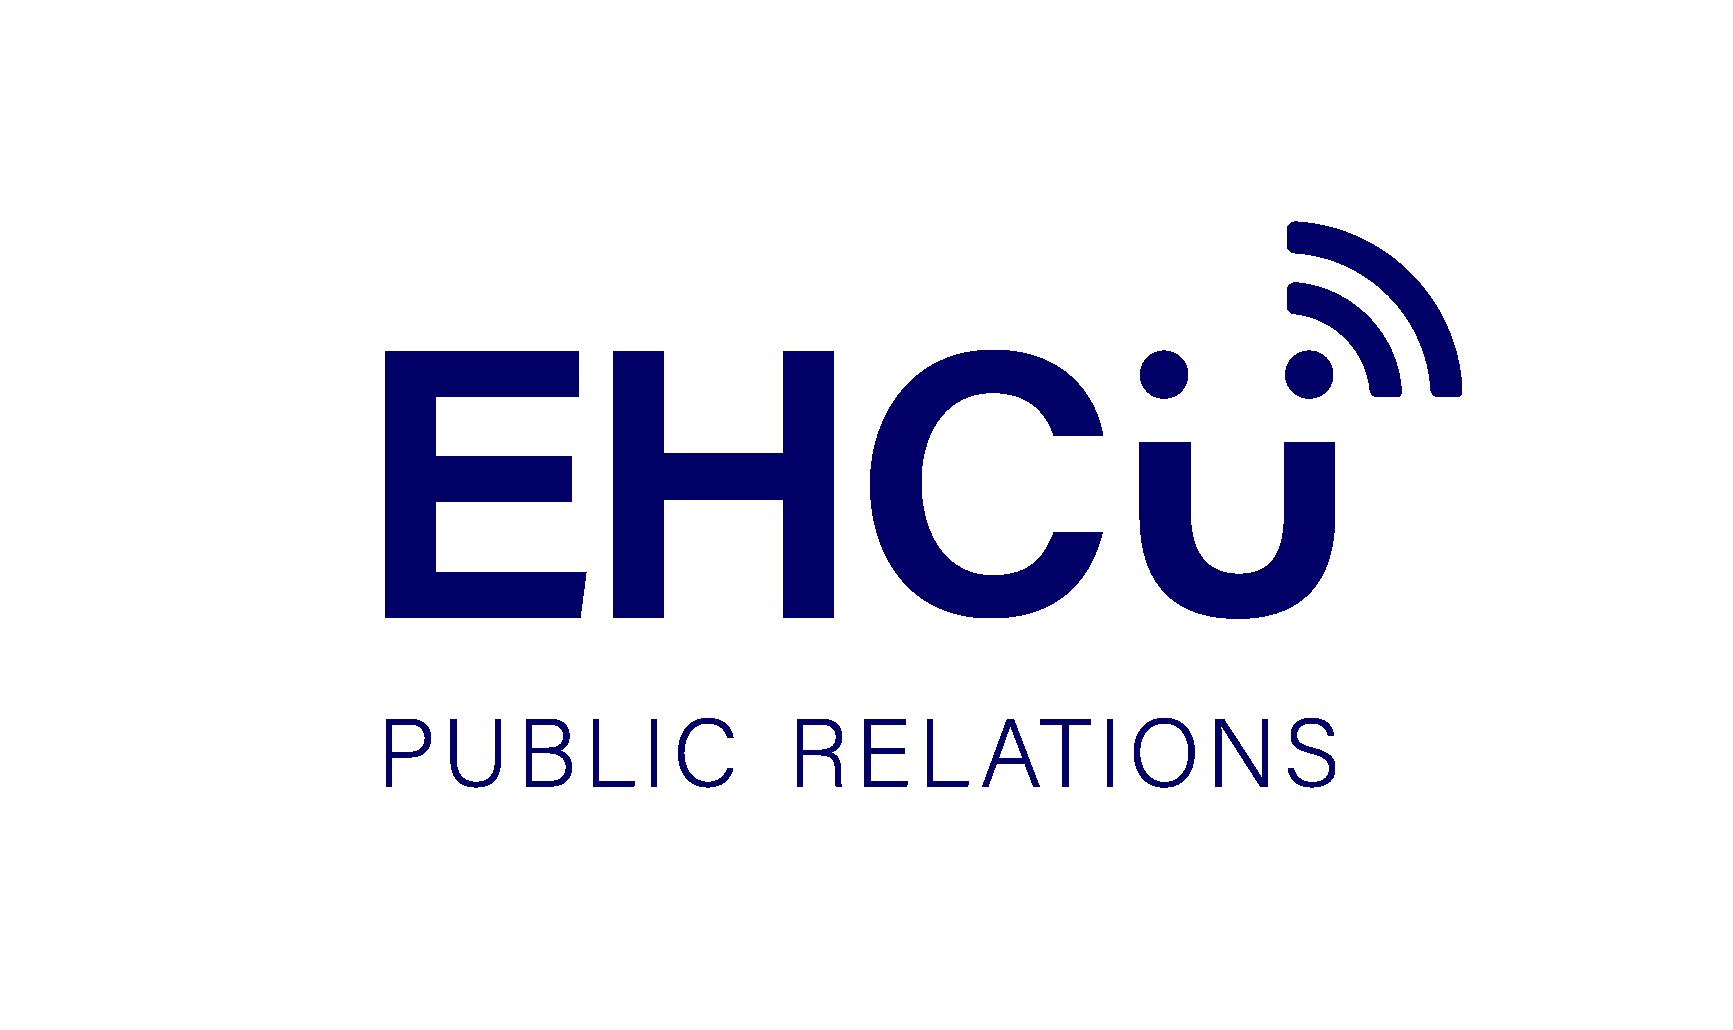 EHCÜ Public Relations Logo